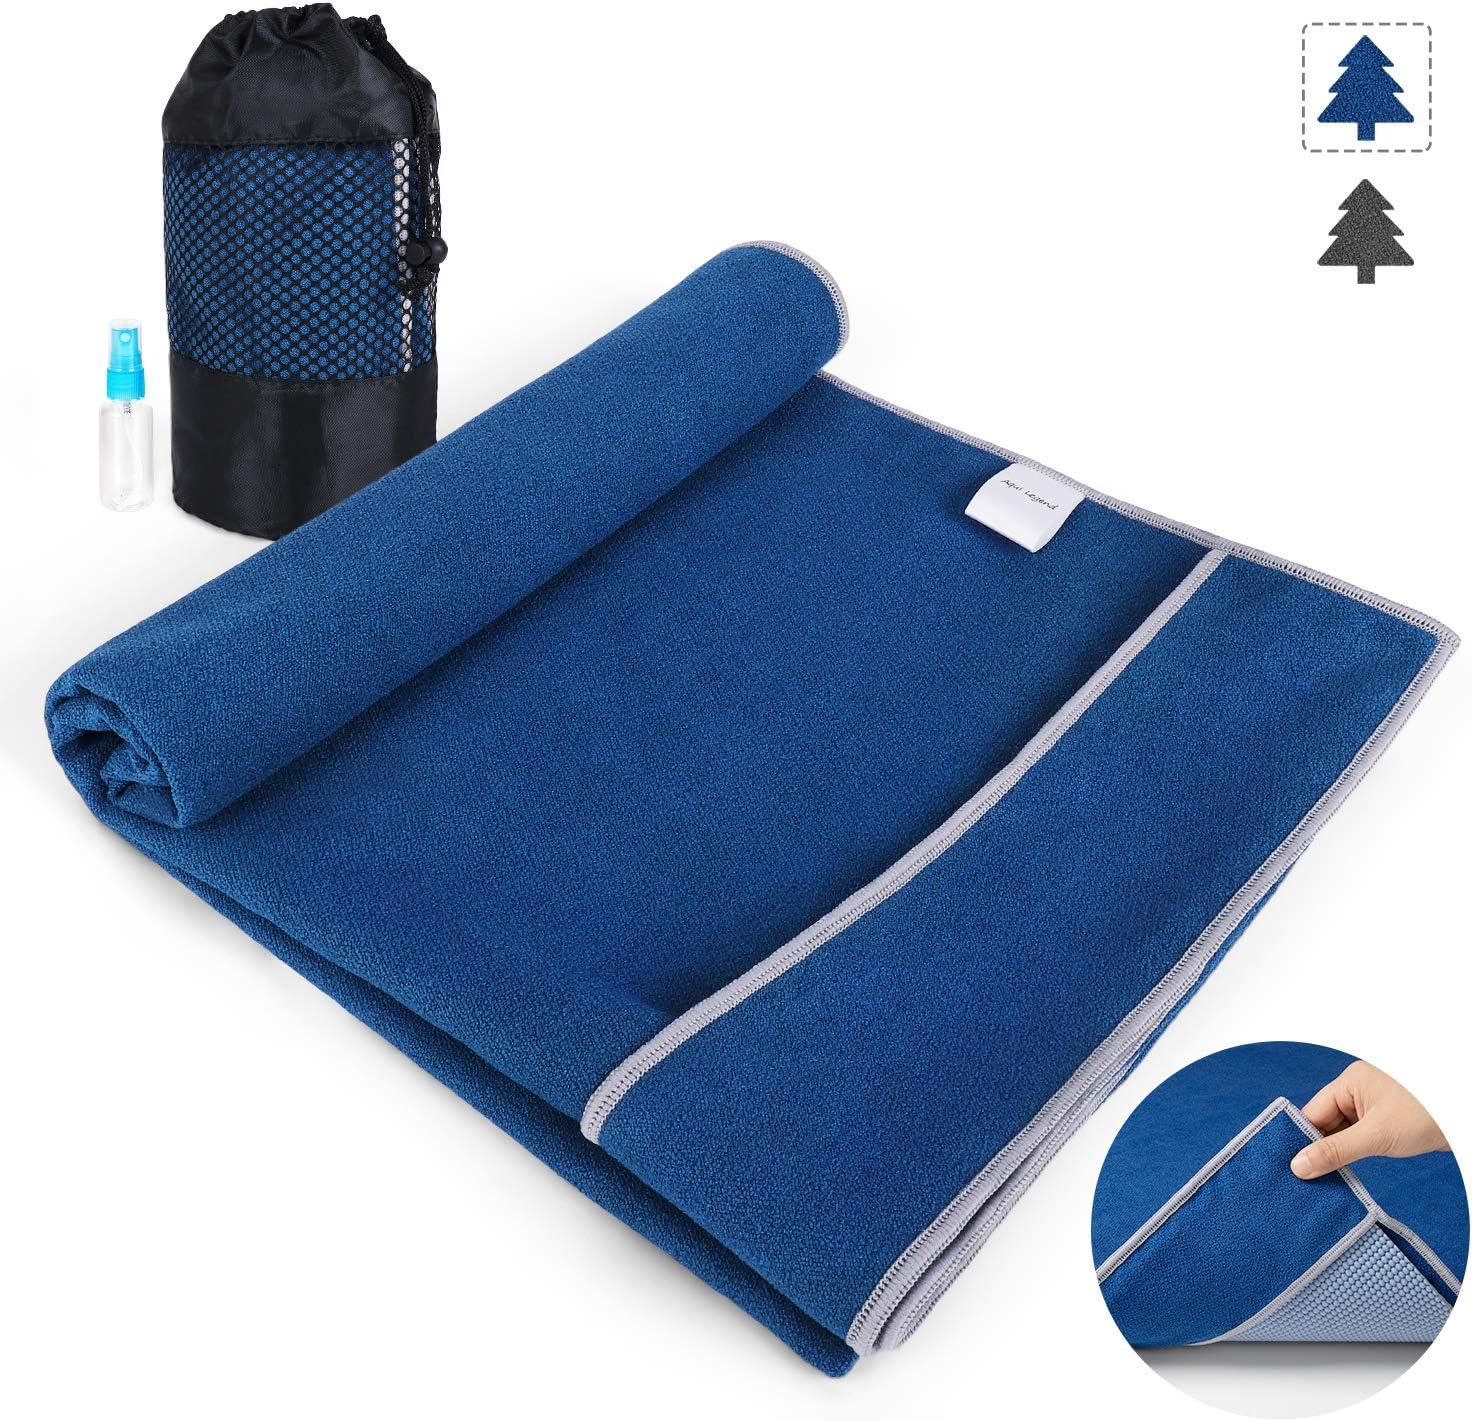 Aqui Legend Non Slip Hot Yoga Towel, Corner Pockets Design for Prevent Bunching-Extra Thick,Super Absorbent,Washable| Perfect Microfiber Yoga Mat ...